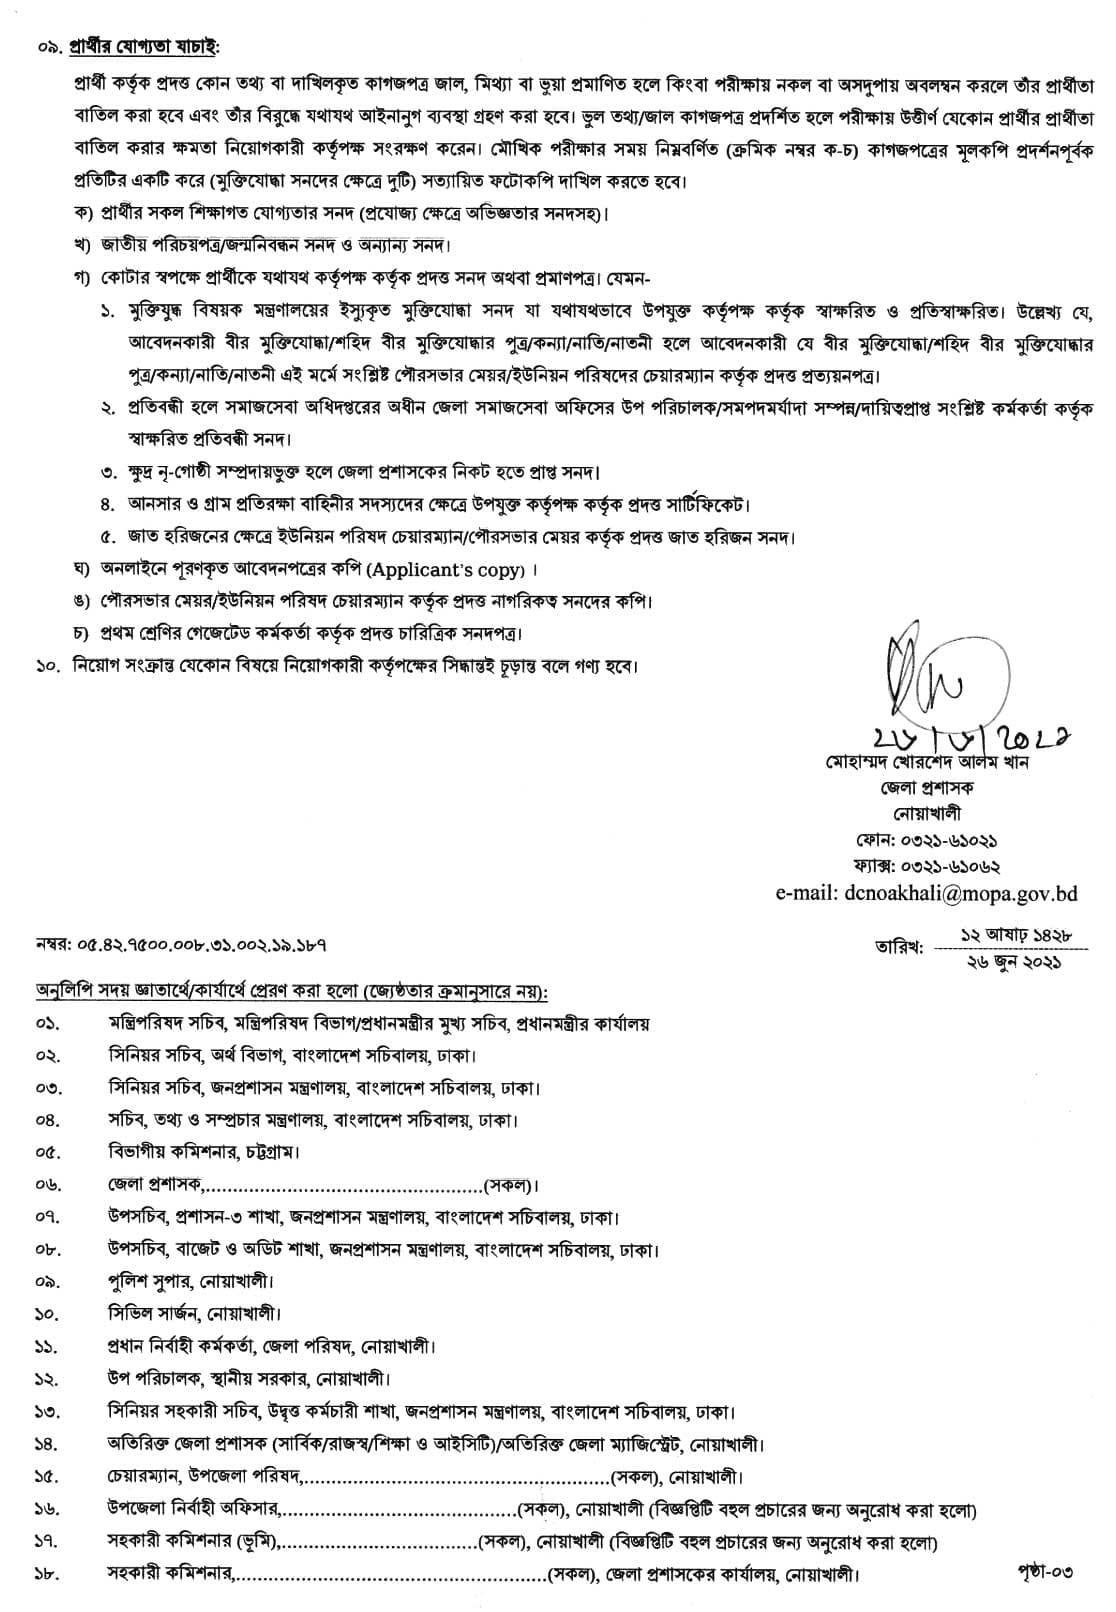 dcnoakhali.teletalk.com.bd